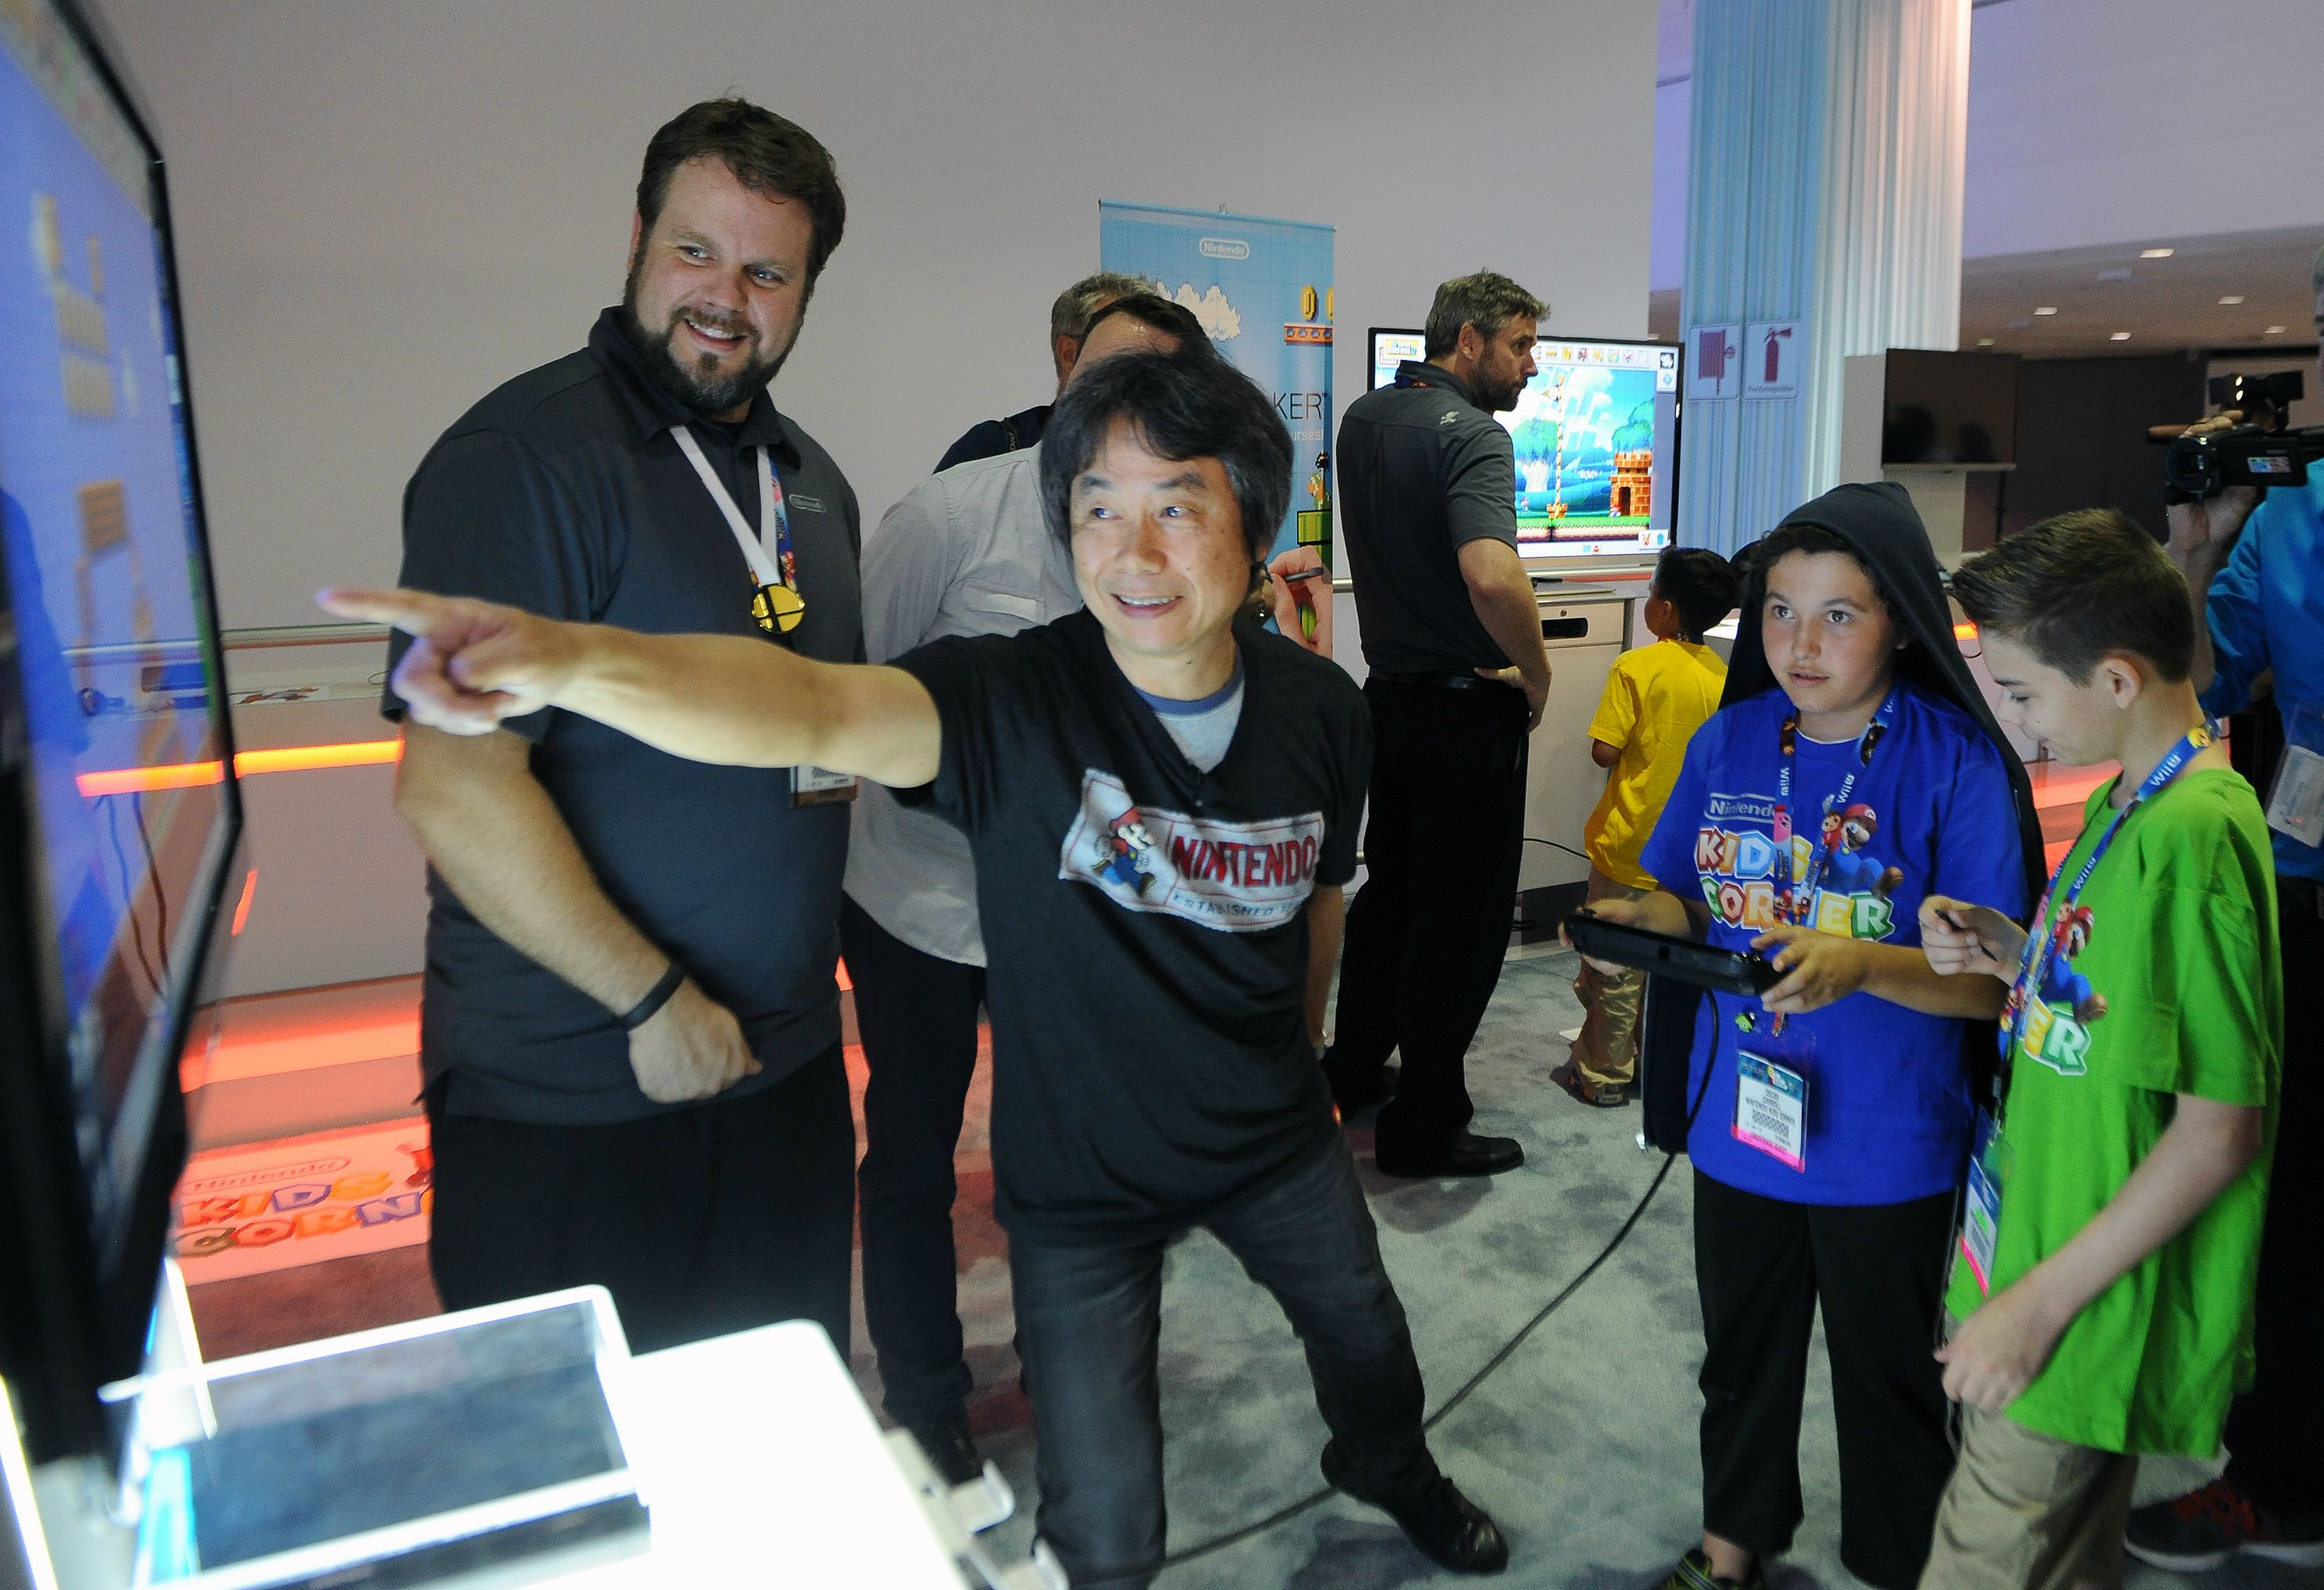 miyamoto_e3.jpg